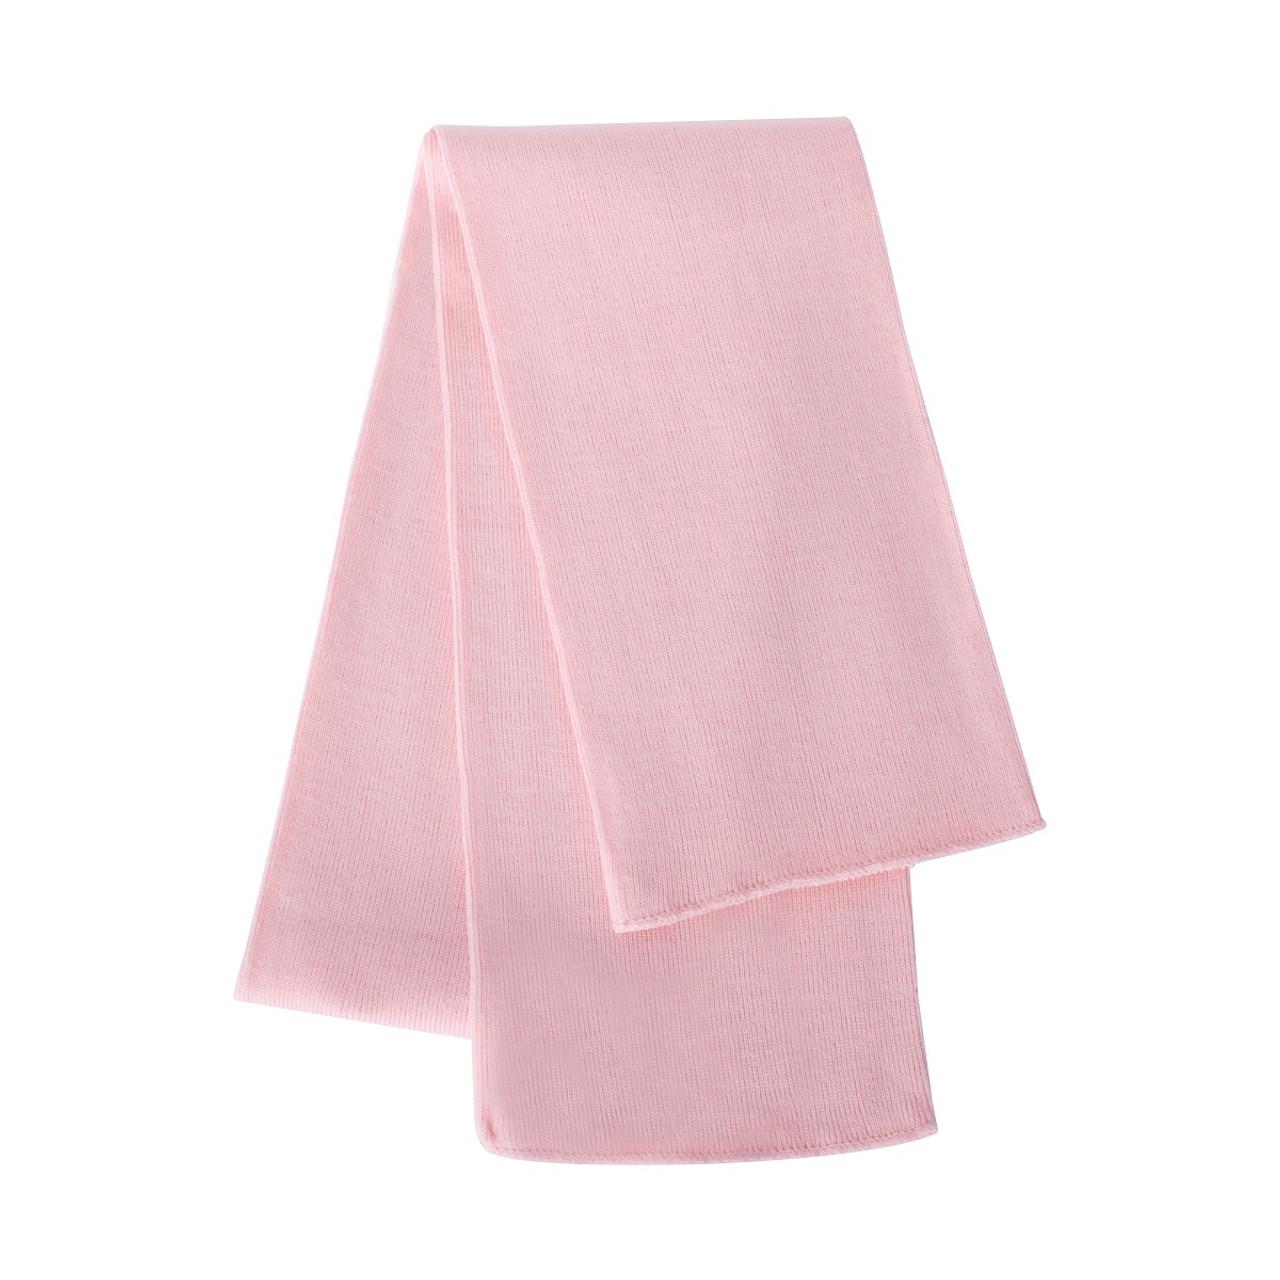 Pink - SP04 Sportsman Knit Scarf | T-shirt.ca